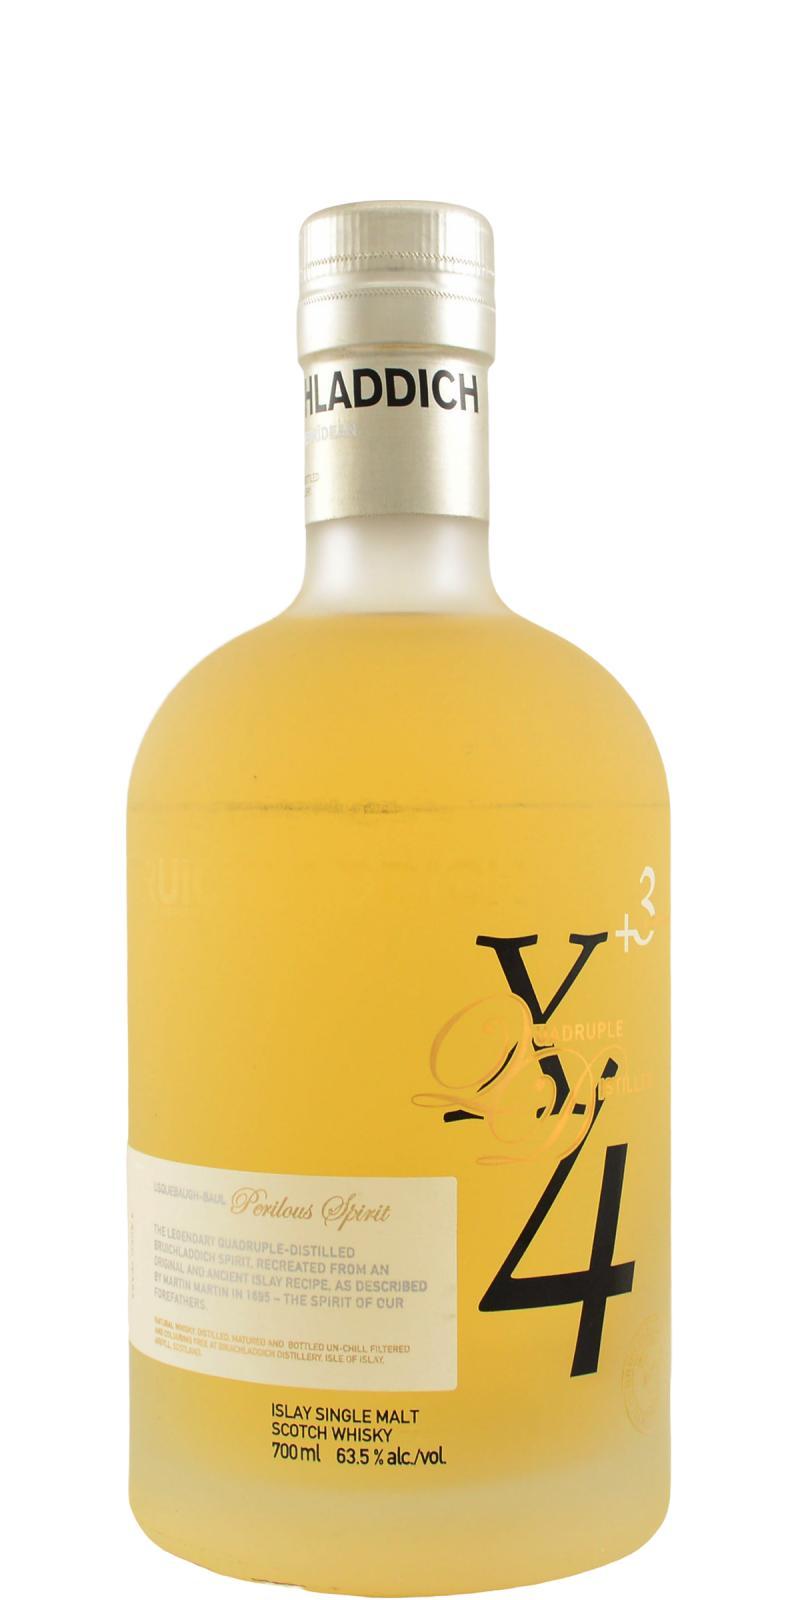 bruichladdich Irish whiskey stone company gifts for menjpg